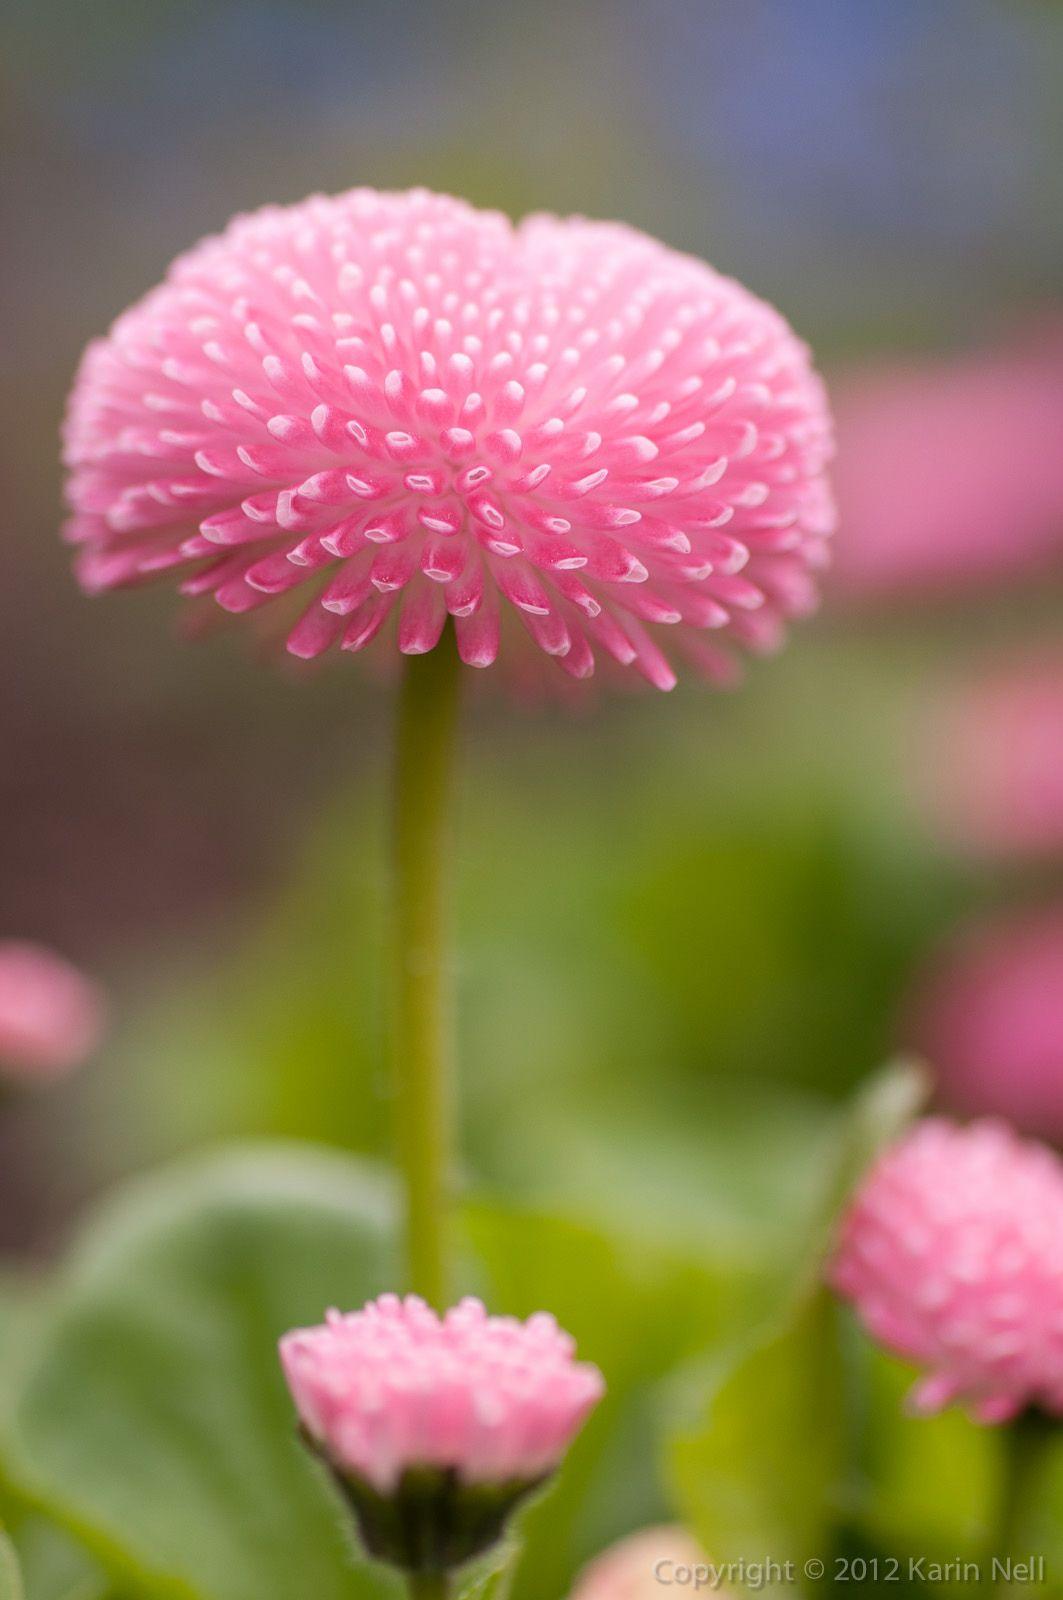 Pomponette english daisy flowers pinterest english flowers pomponette english daisy by karinnell izmirmasajfo